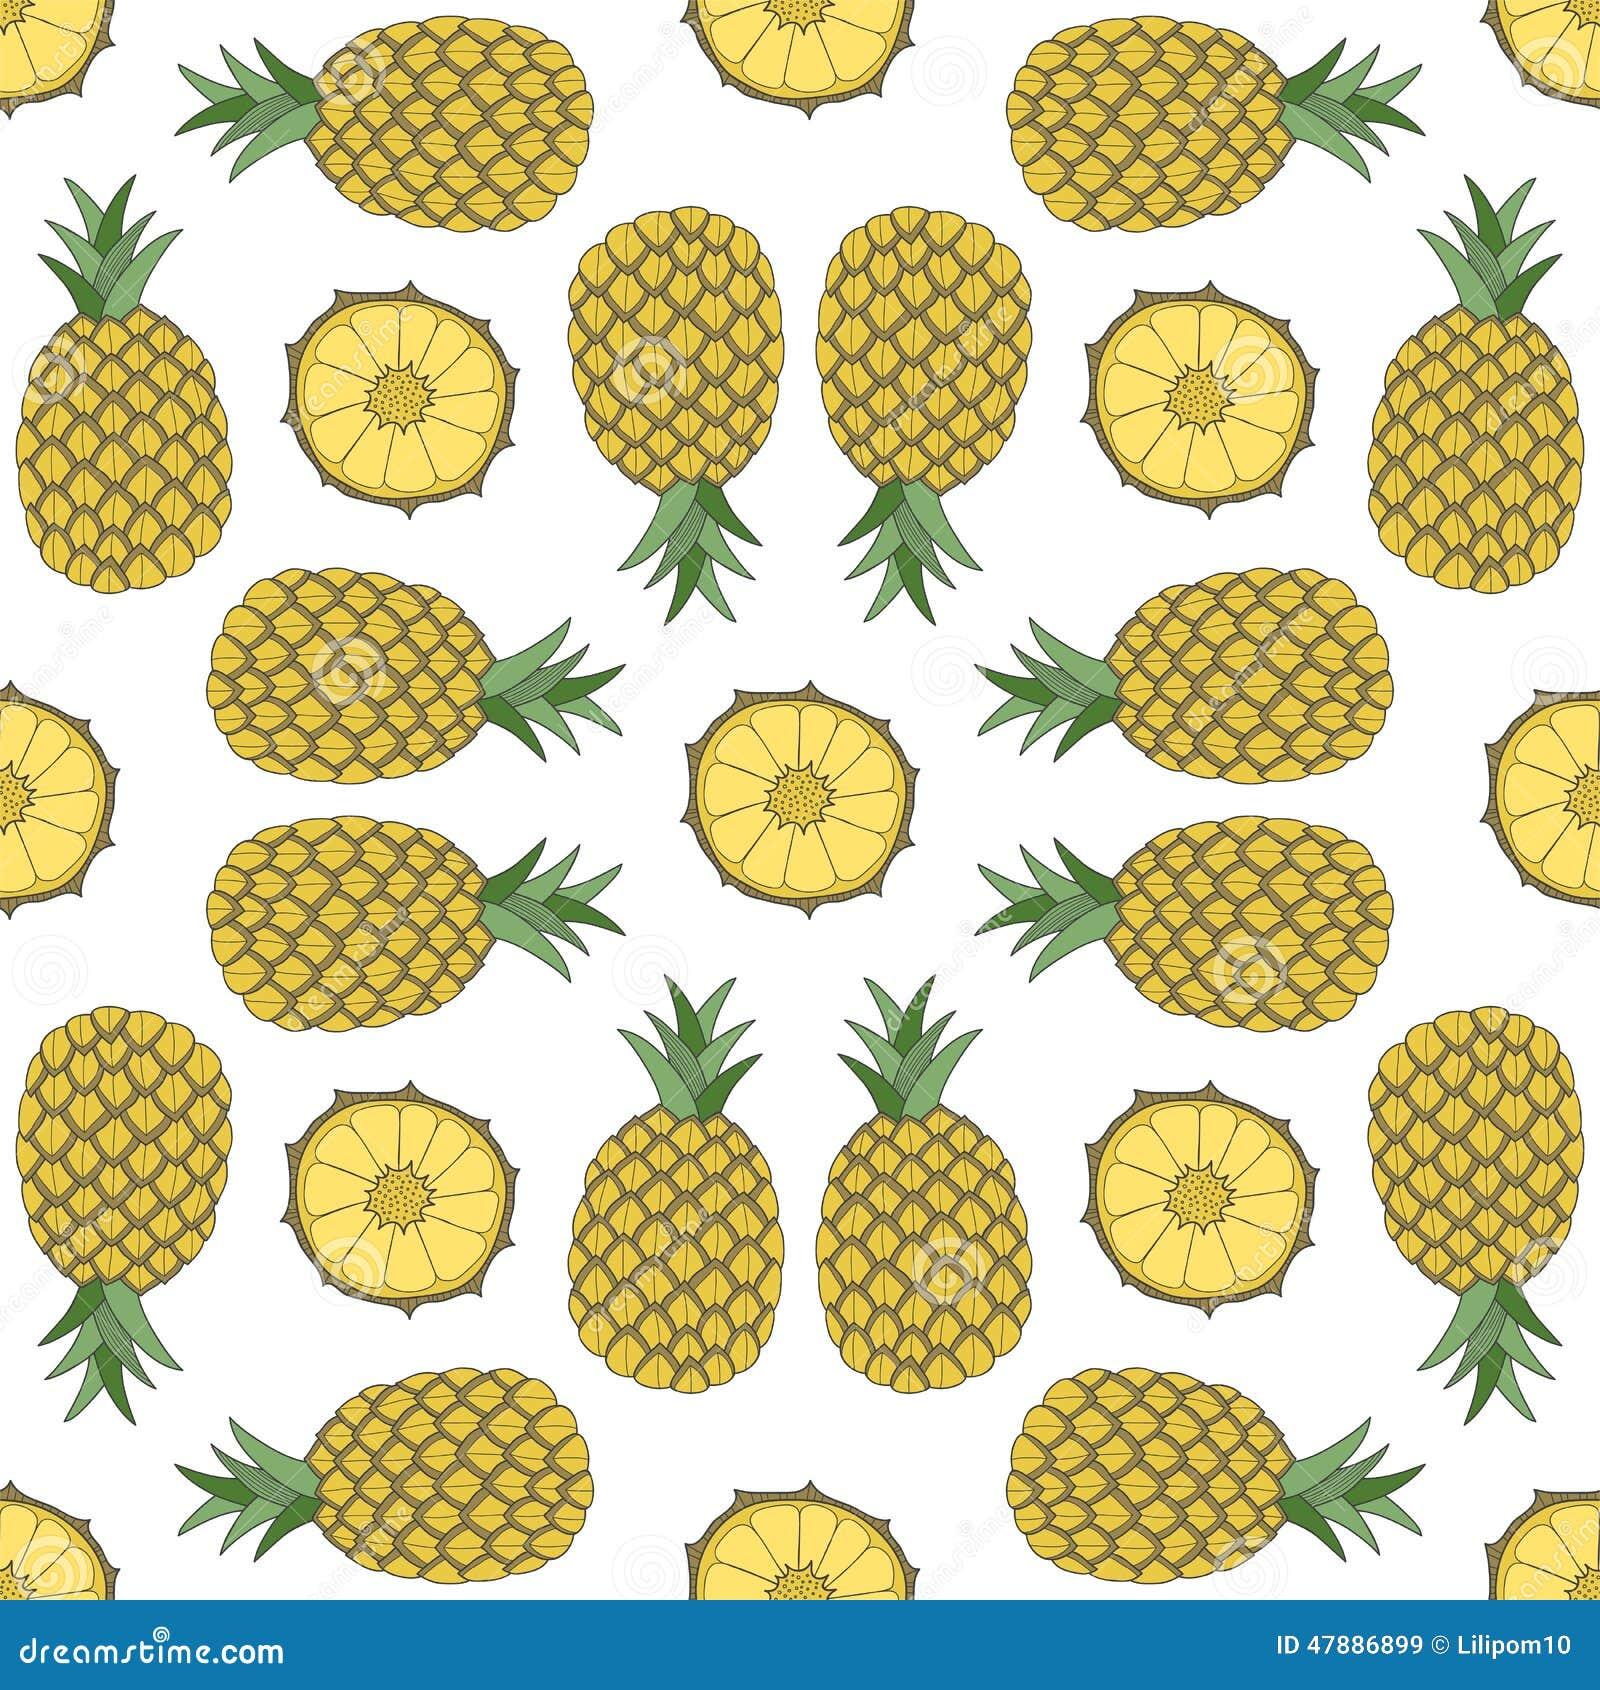 pineapple desktop wallpaper